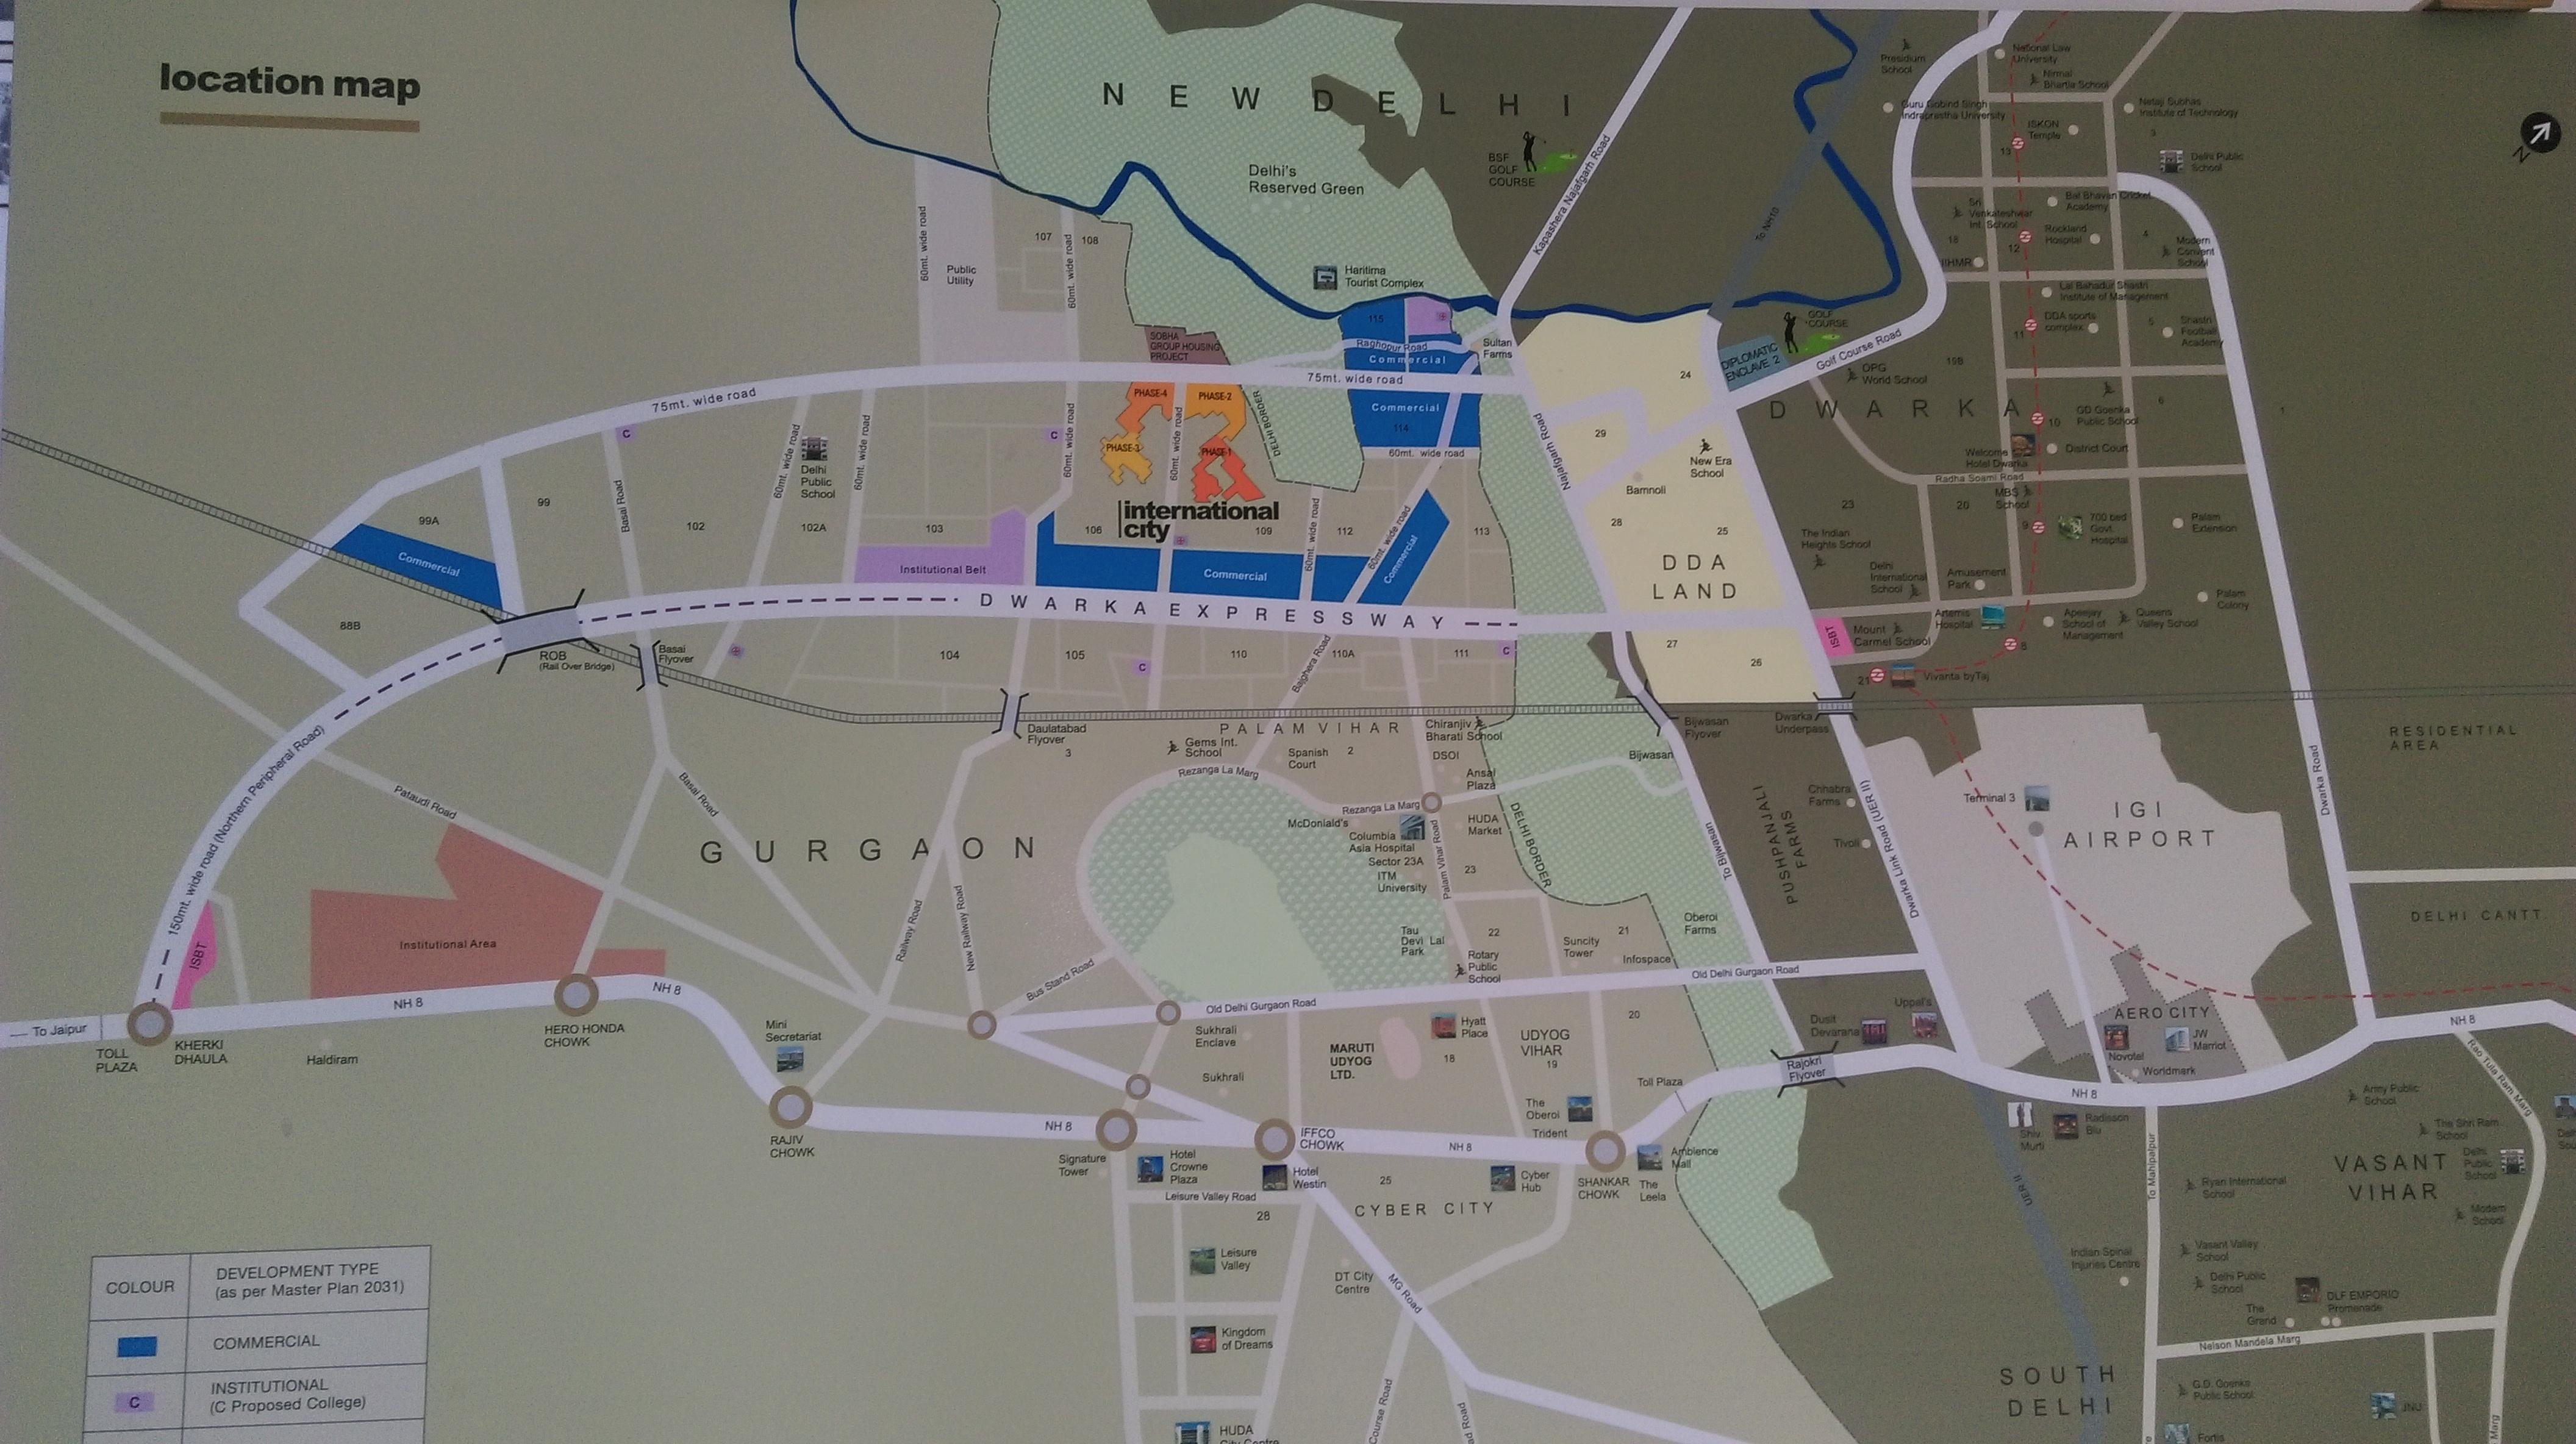 Location map of Sobha International City